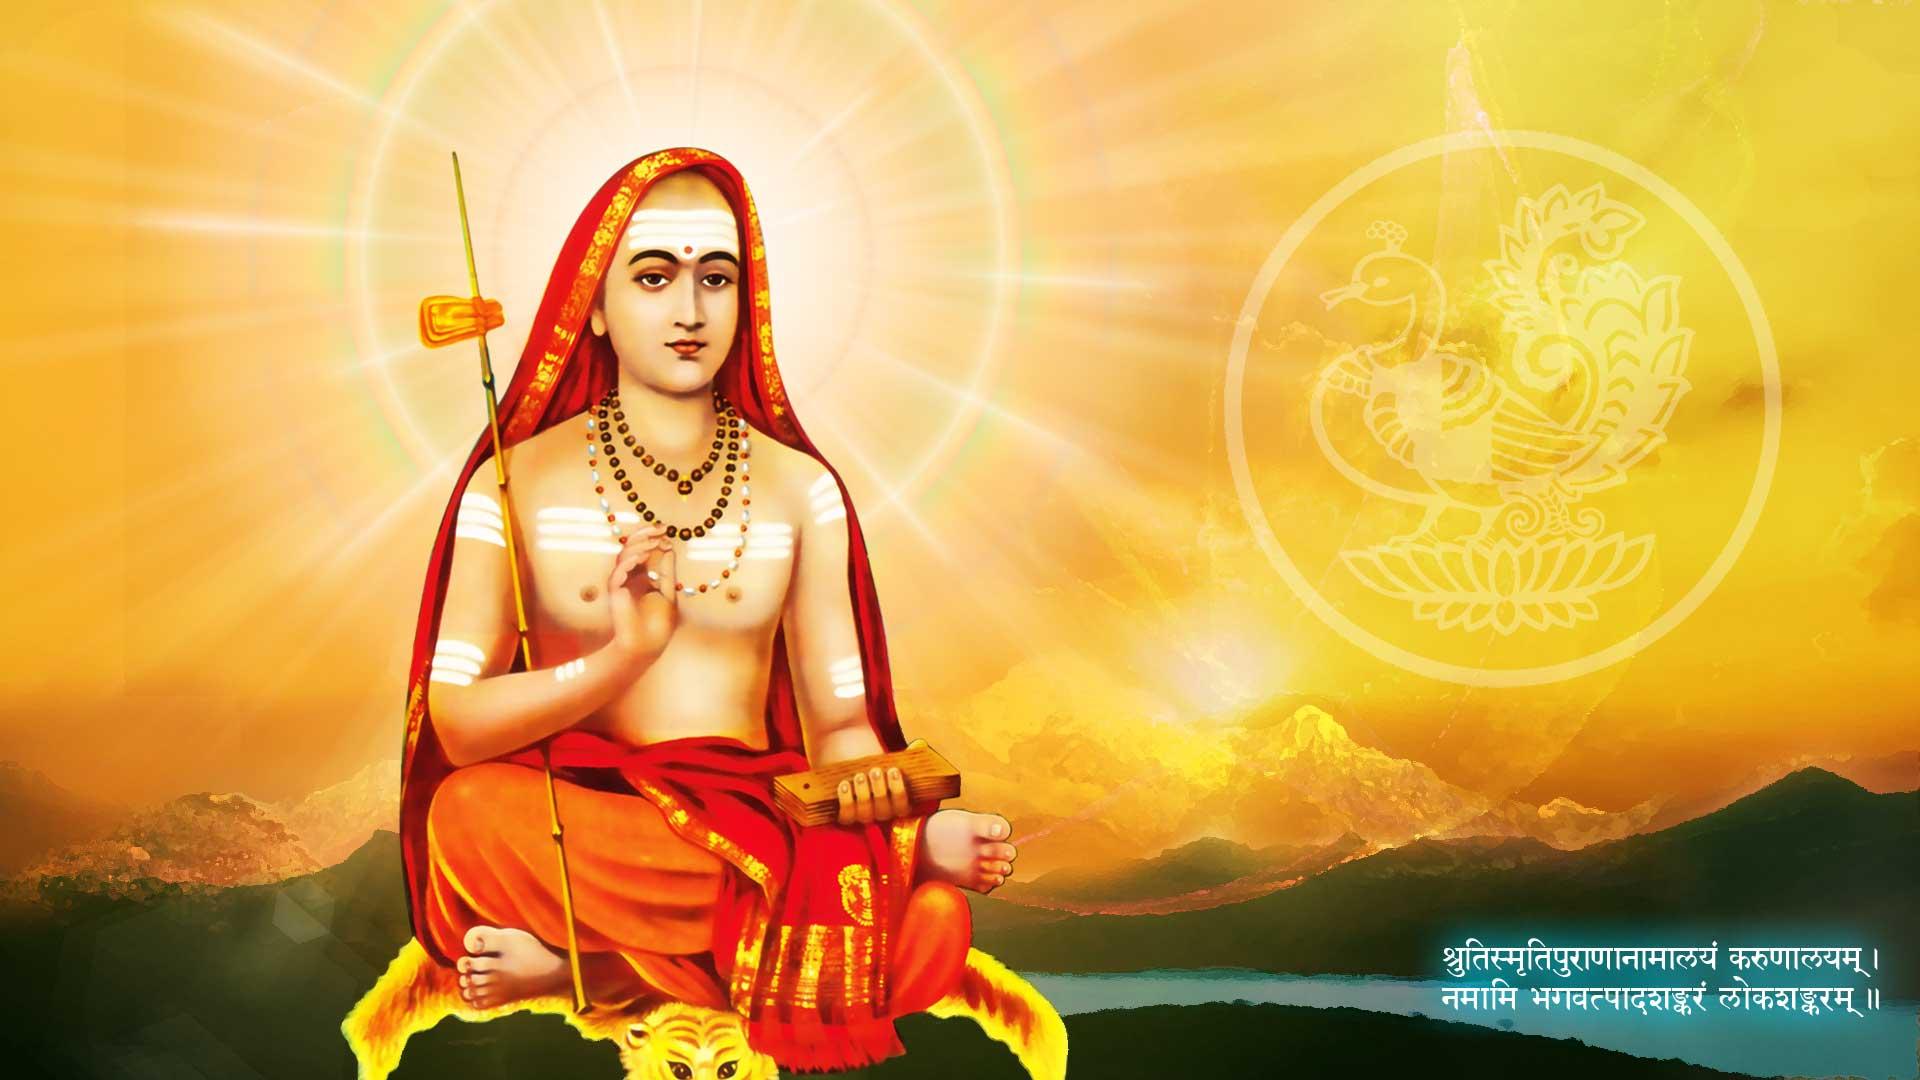 Sri Shankara's Integral Outlook